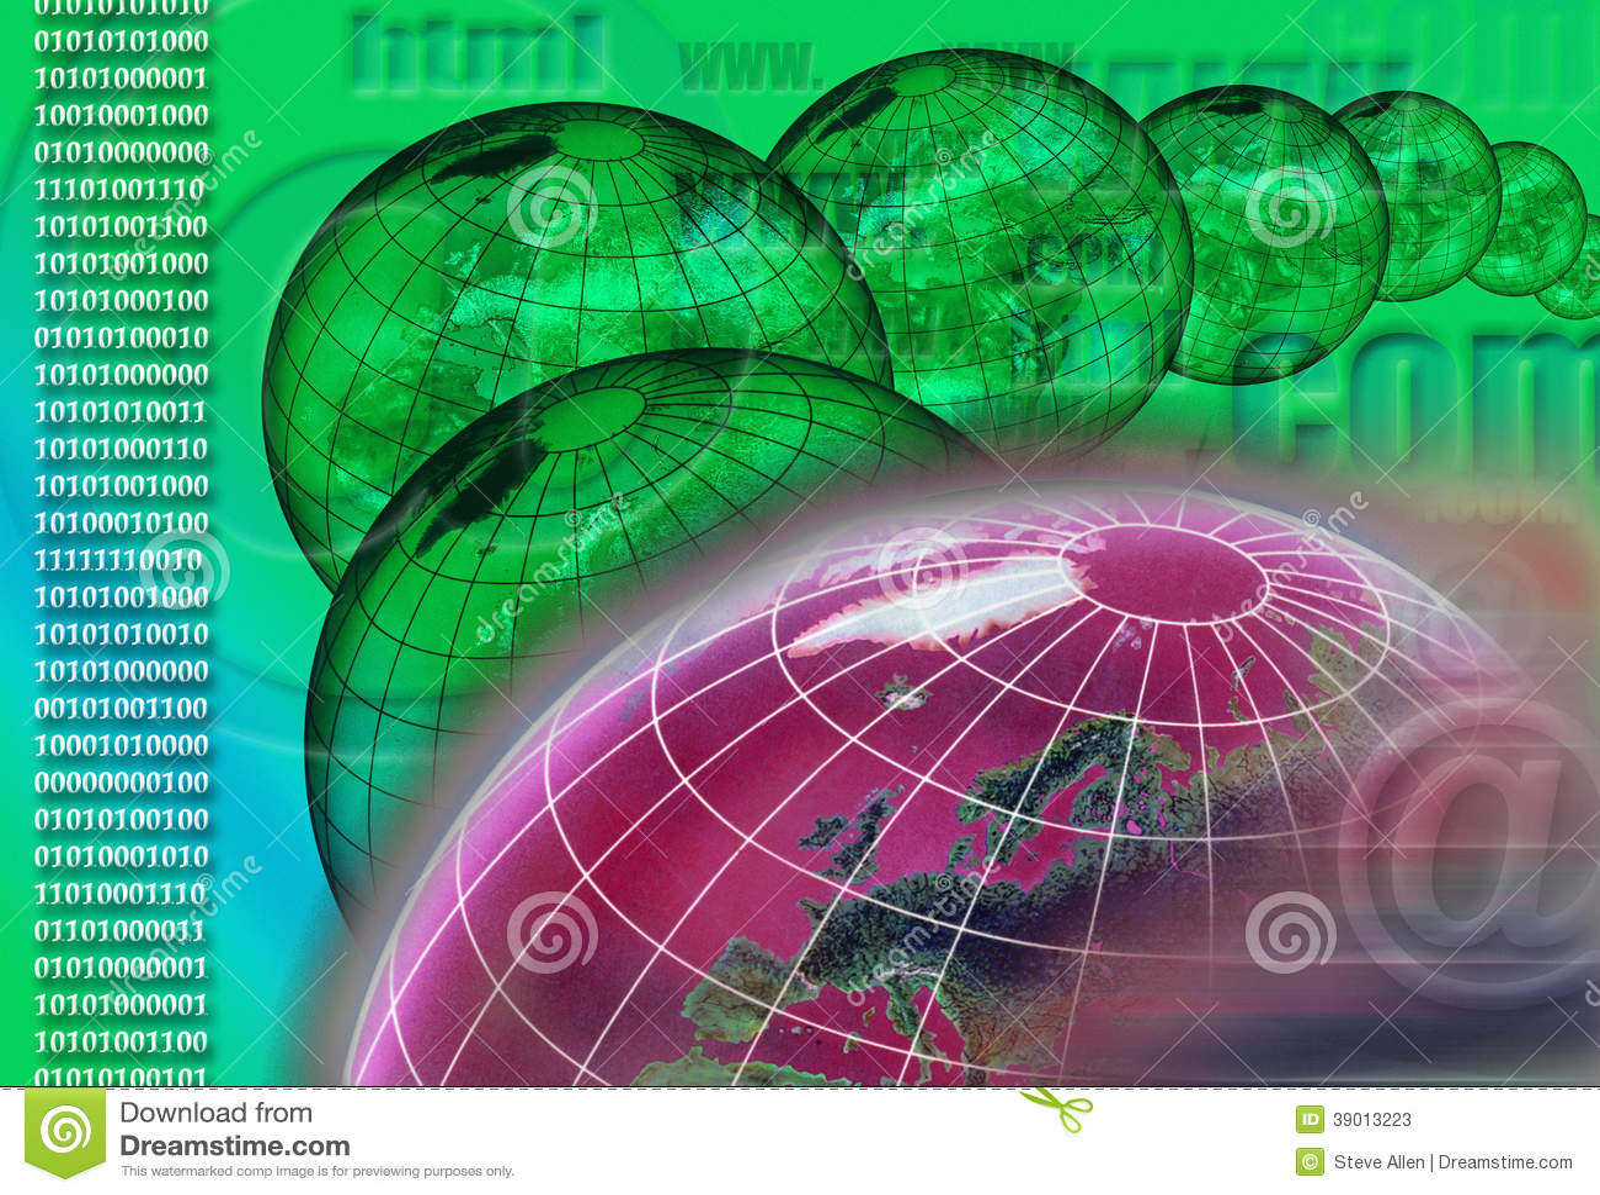 Över hela världen - internet - cyberspace